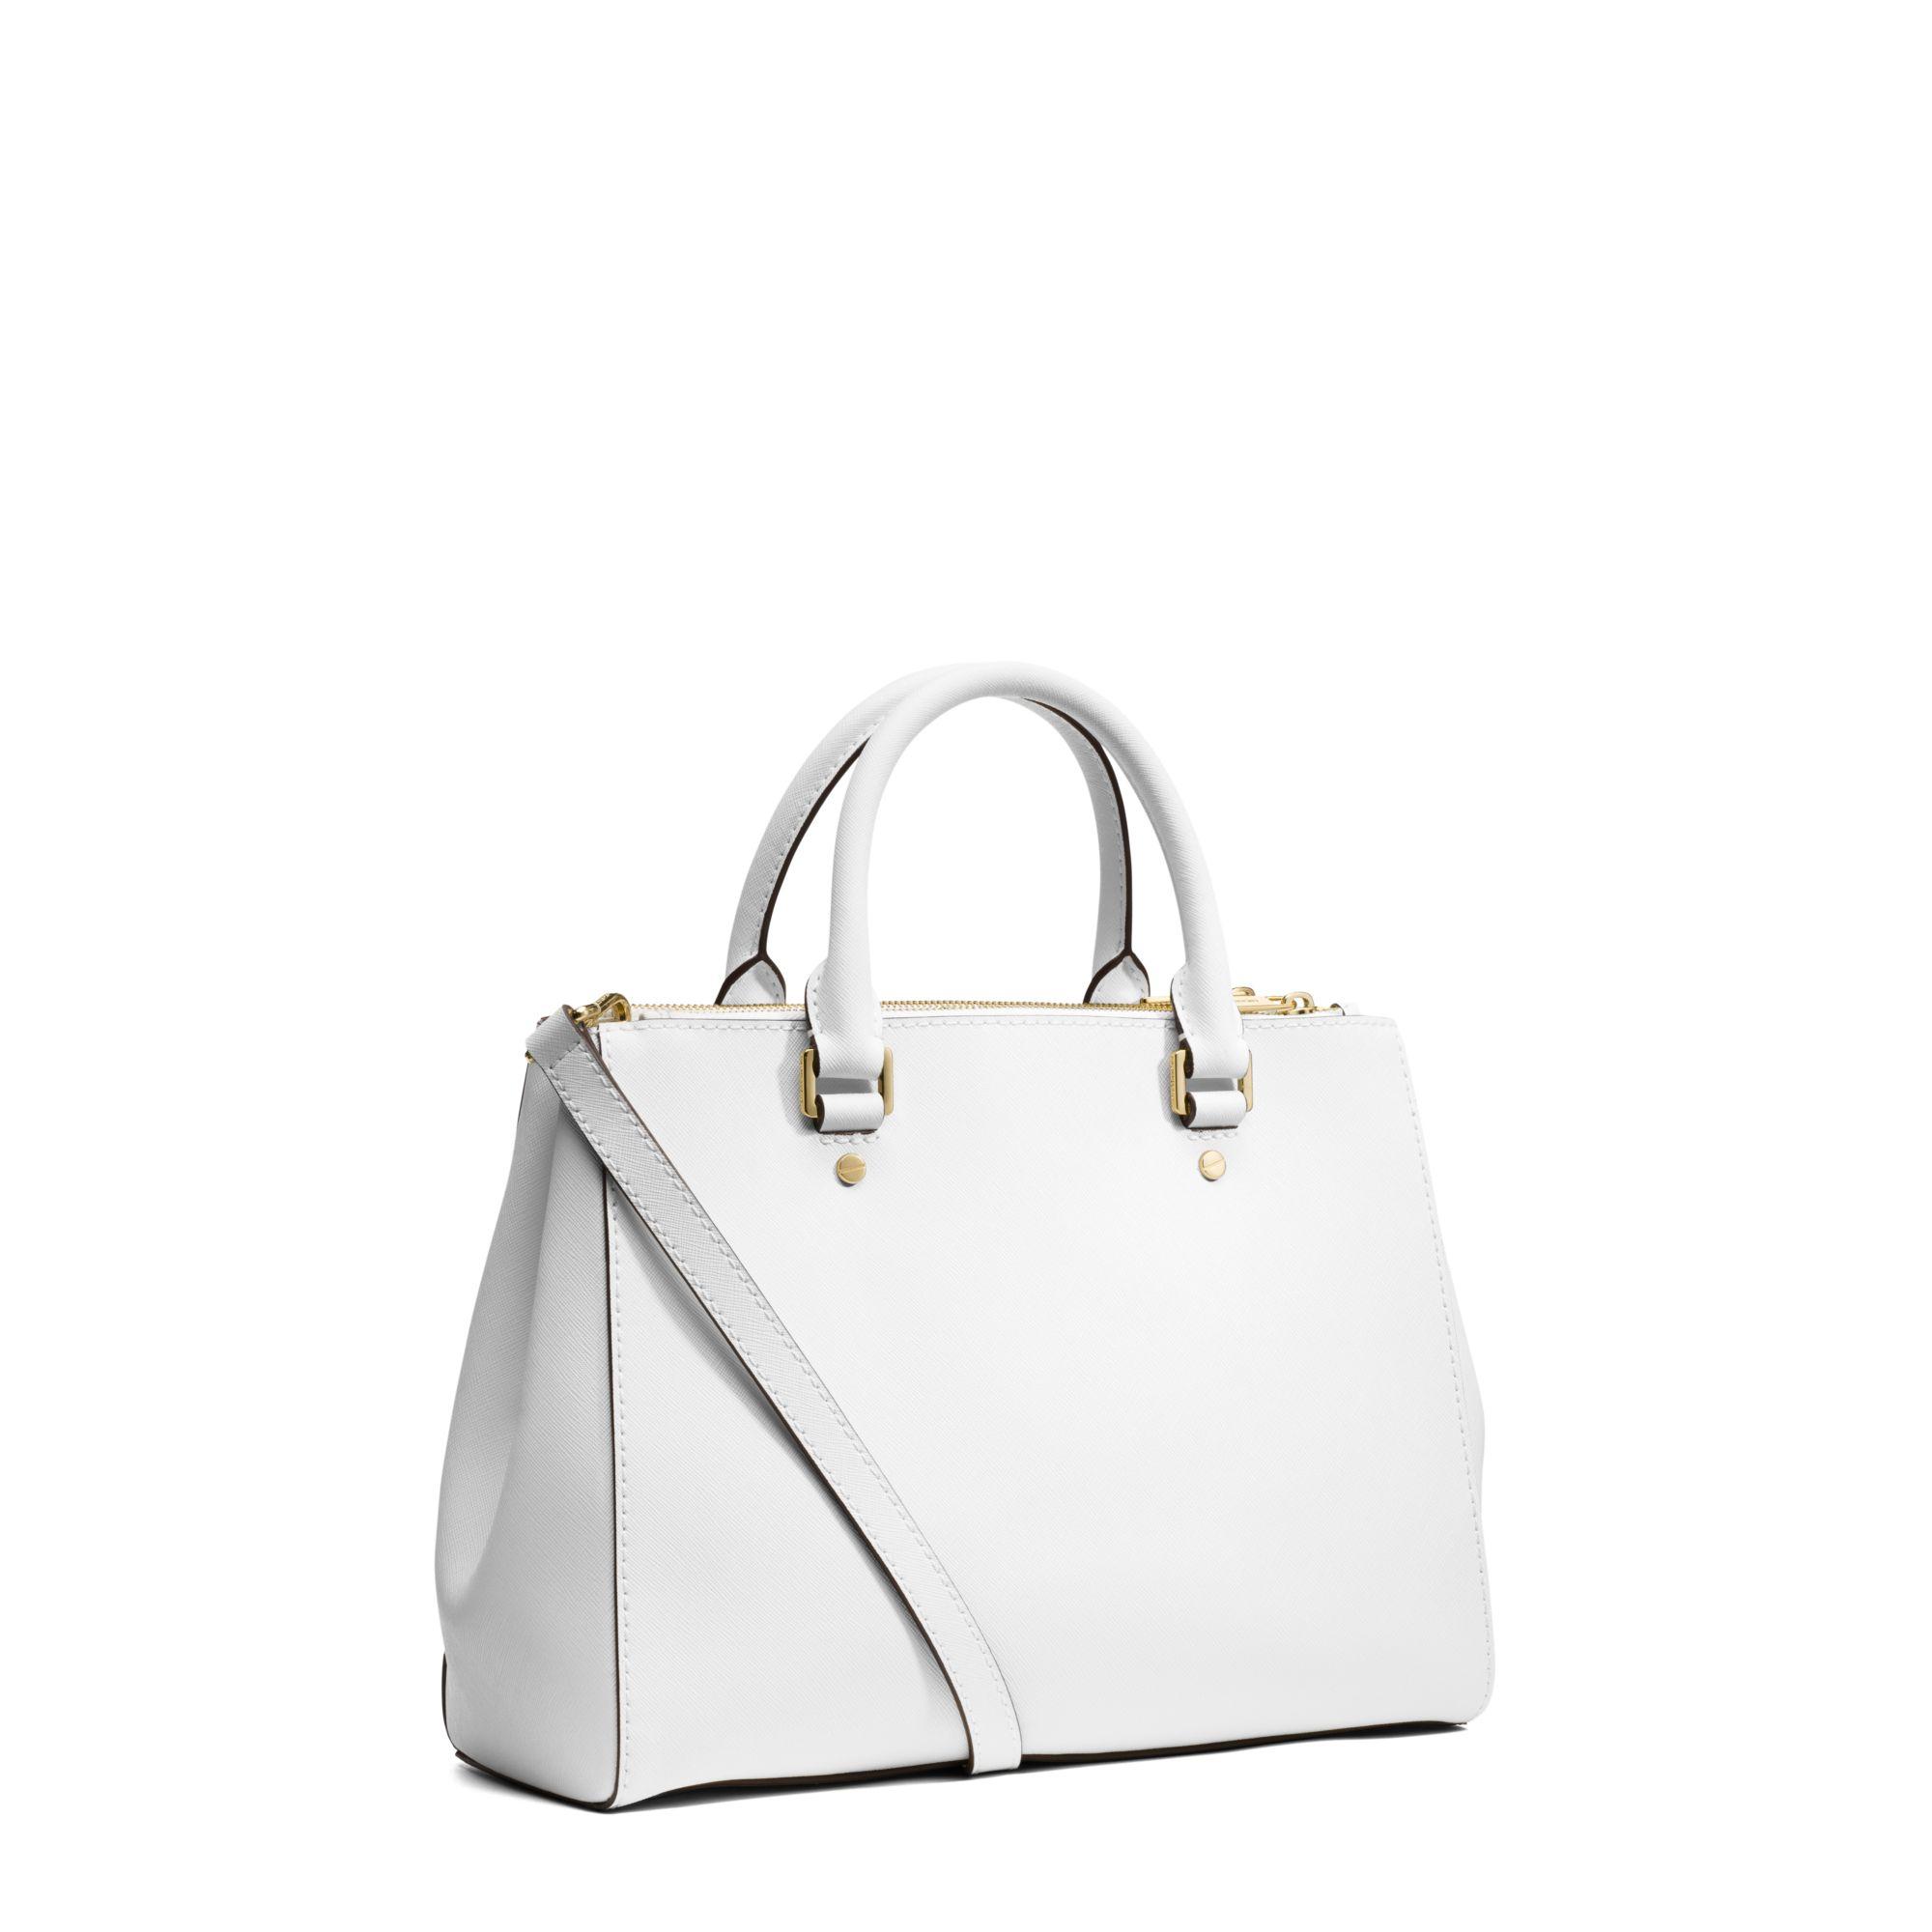 9b48b783cf033 ... Saffiano Leather Medium Satchel - Optic White Gallery. Womens Michael  By Michael Kors Sutton ...